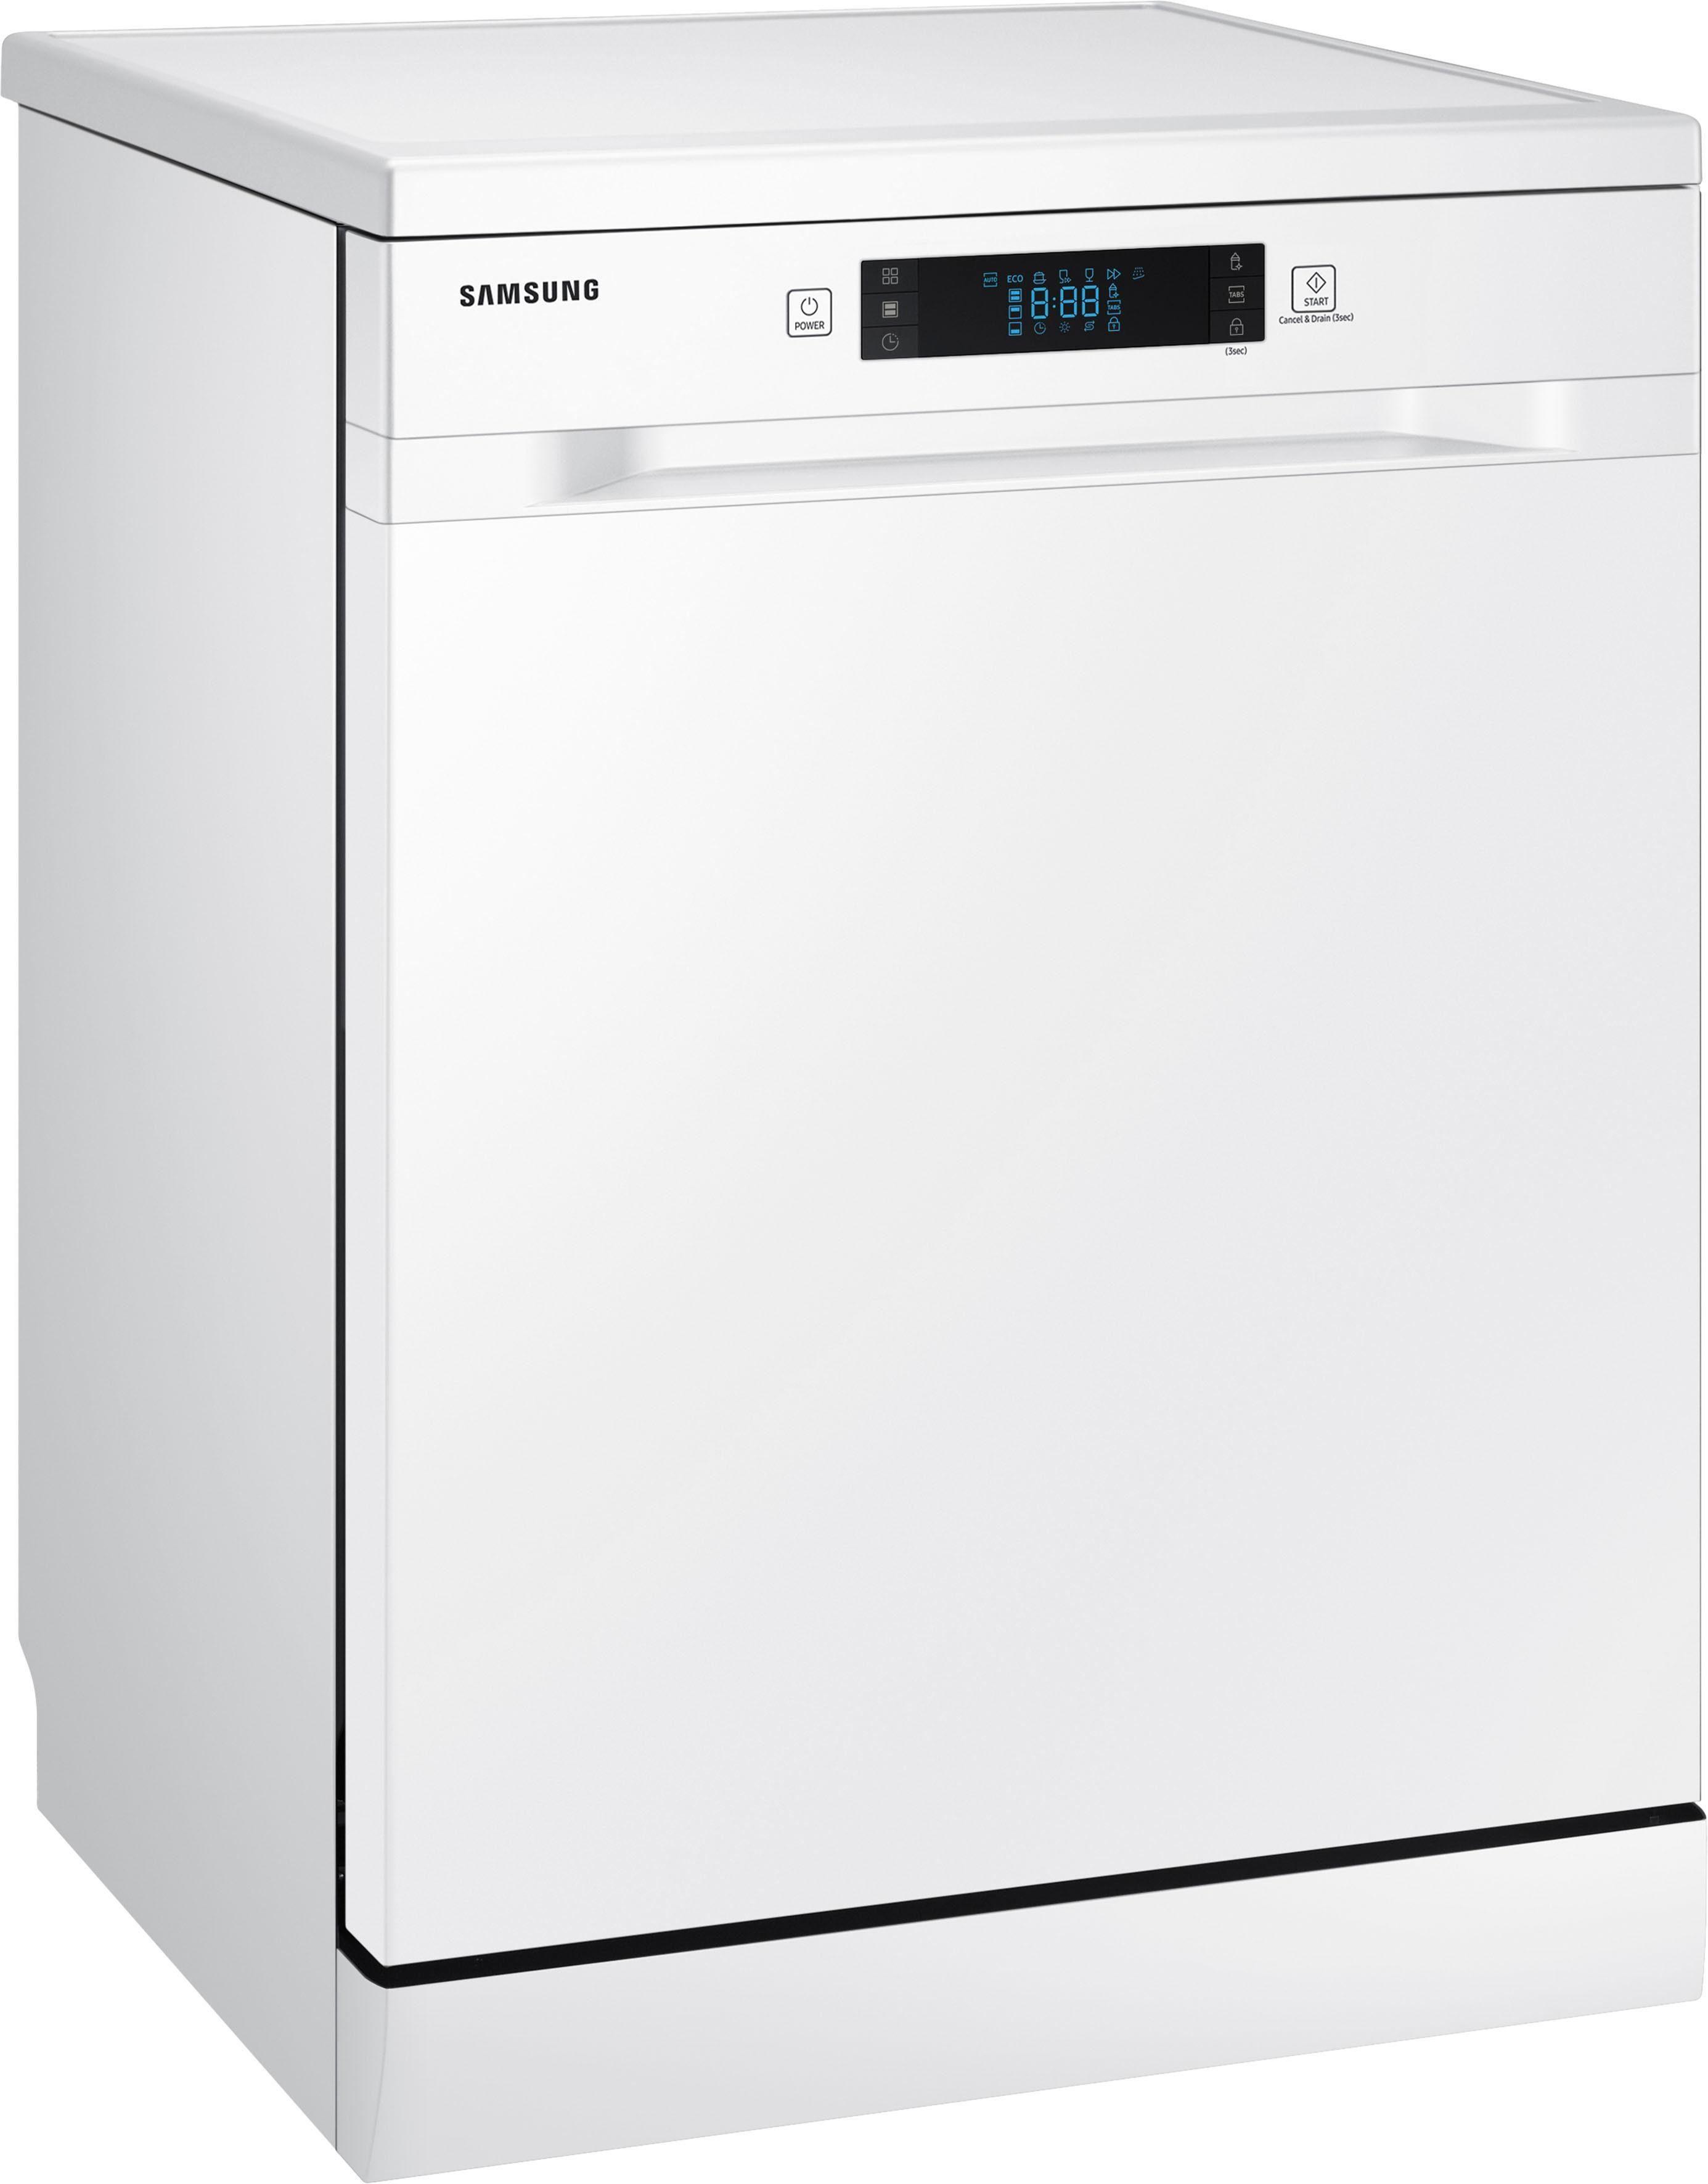 Samsung Standgeschirrspüler DW5500, DW60M6050FW/EC, 10,5 l, 14 Maßgedecke